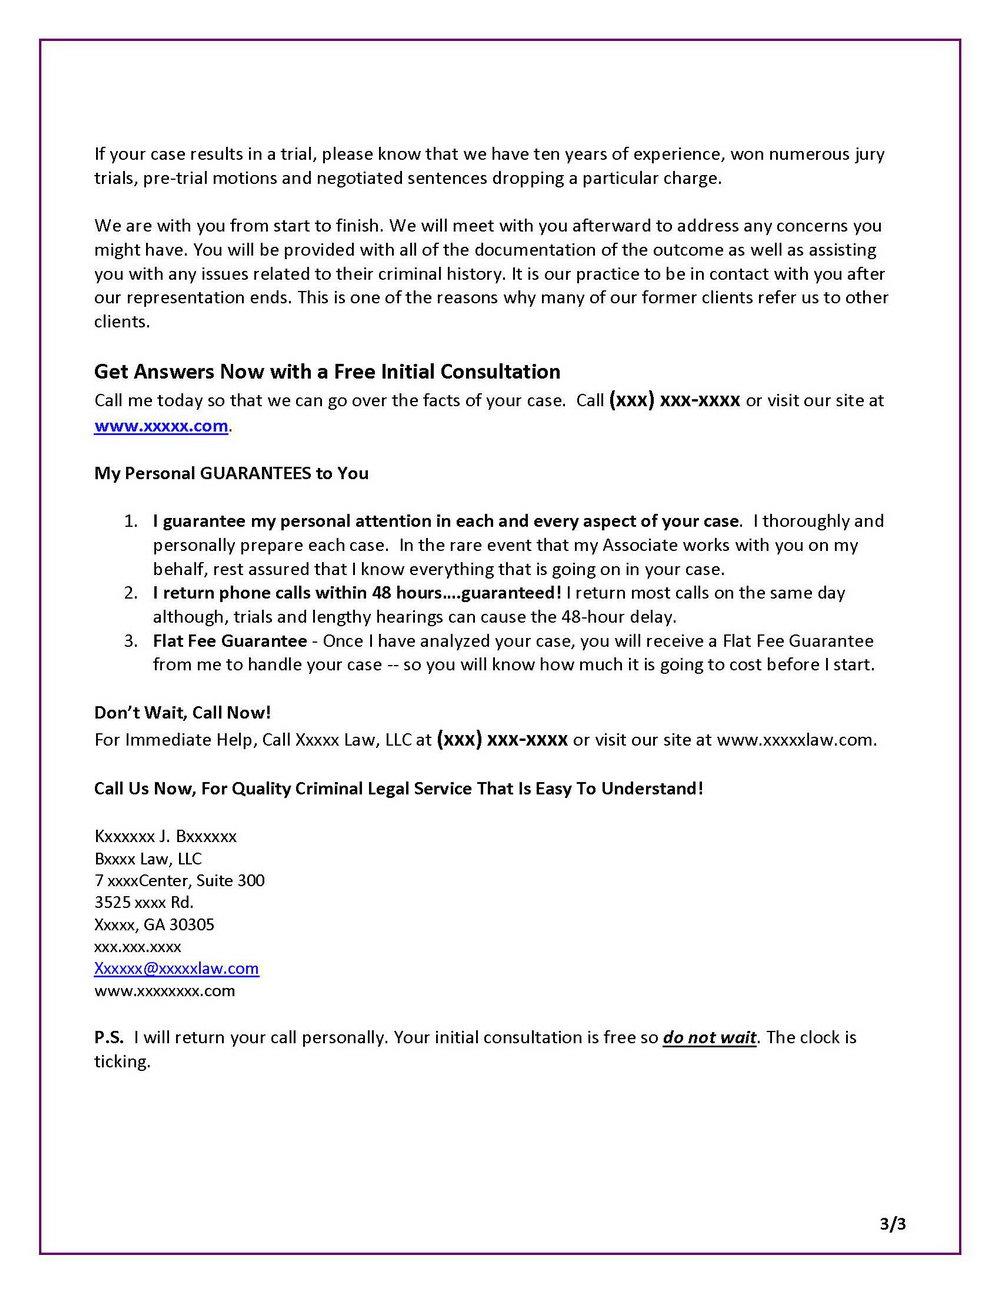 Ctc Full Form In Resume